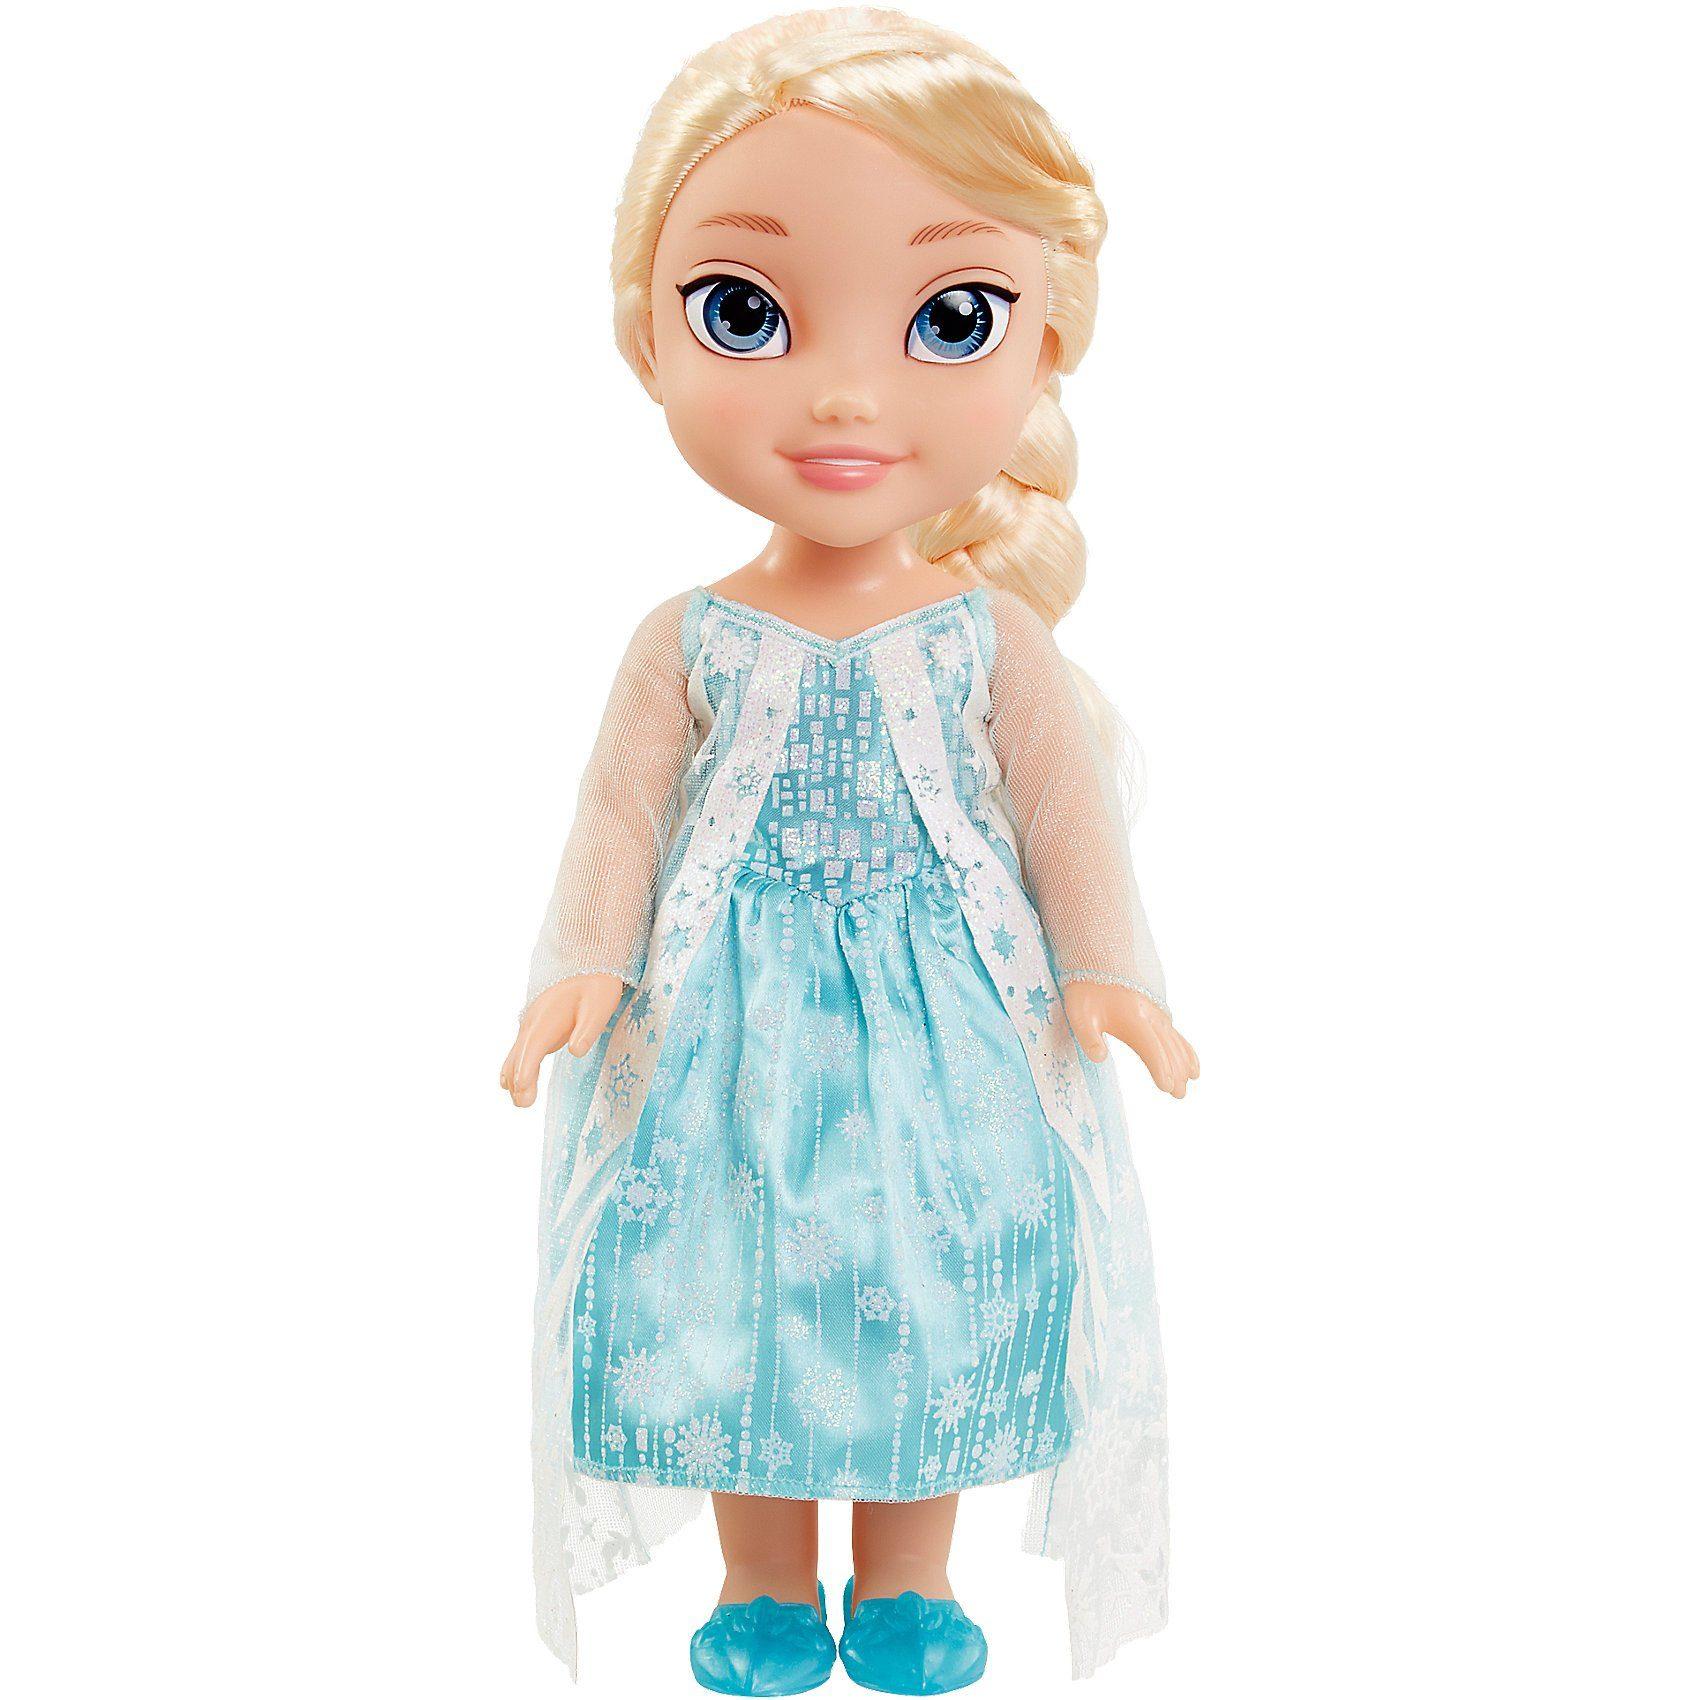 Jakks Pacific Disney Frozen Elsa Stehpuppe mit Glitzer Cape 35 cm